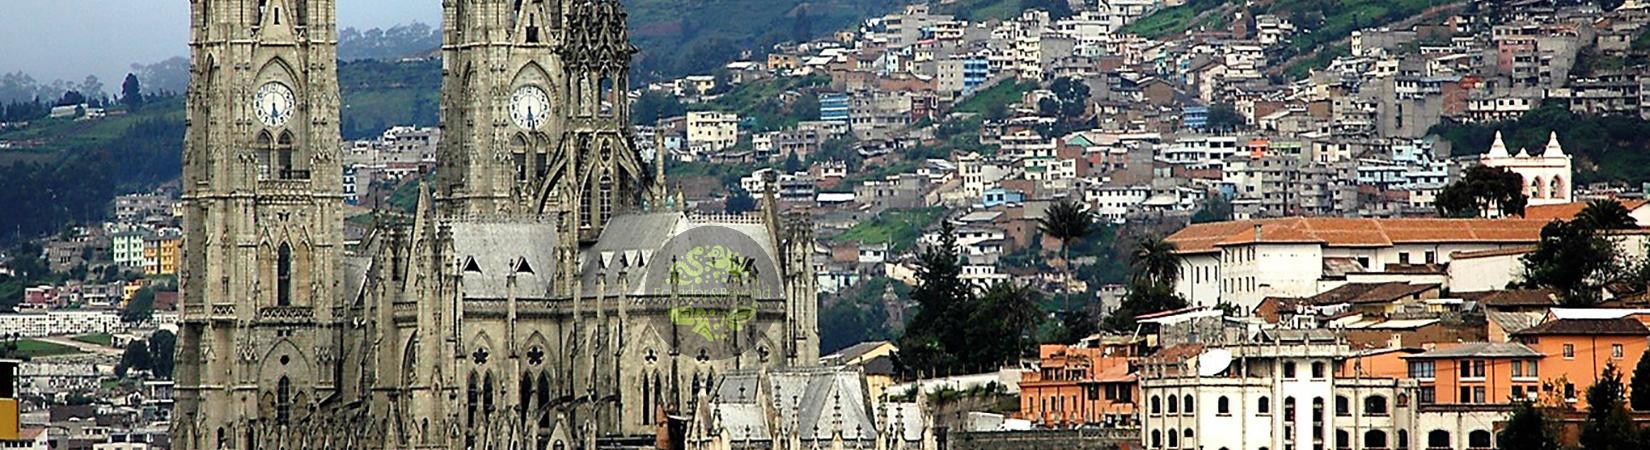 Iglesia la Basílica